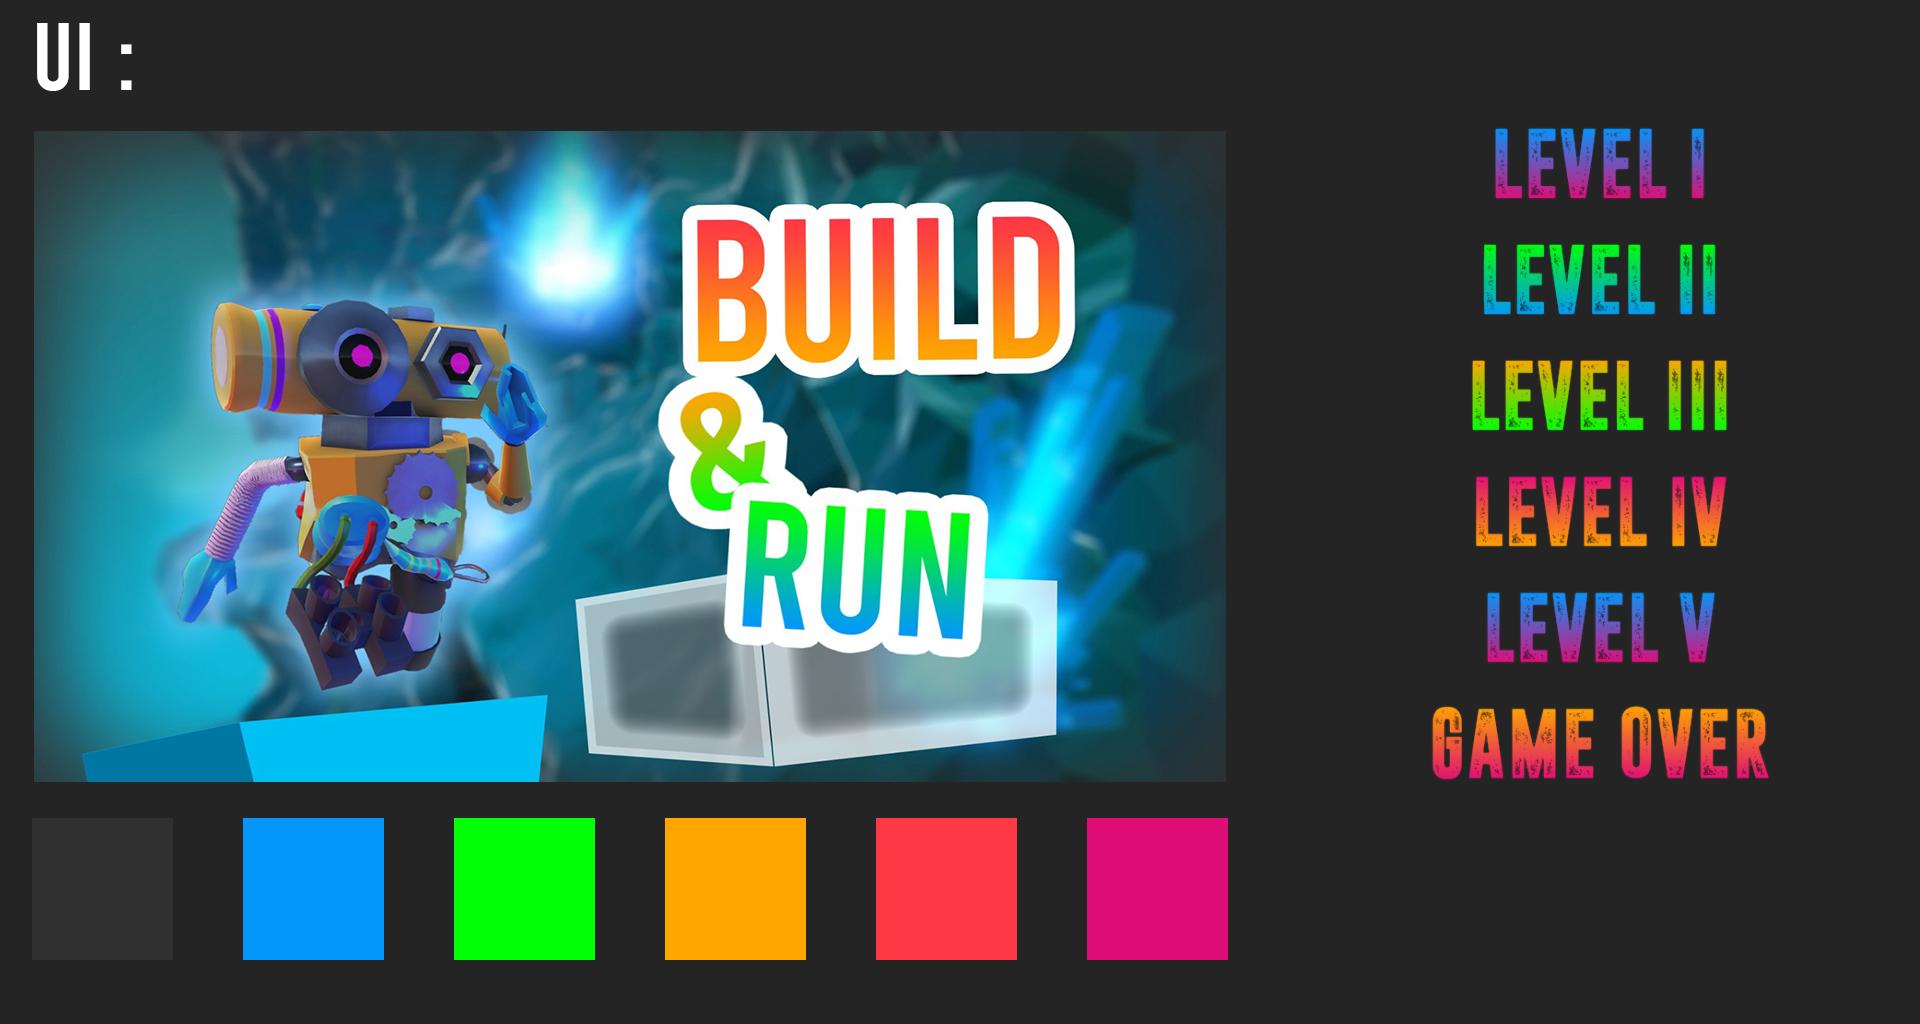 UI_Build_and_Run_02